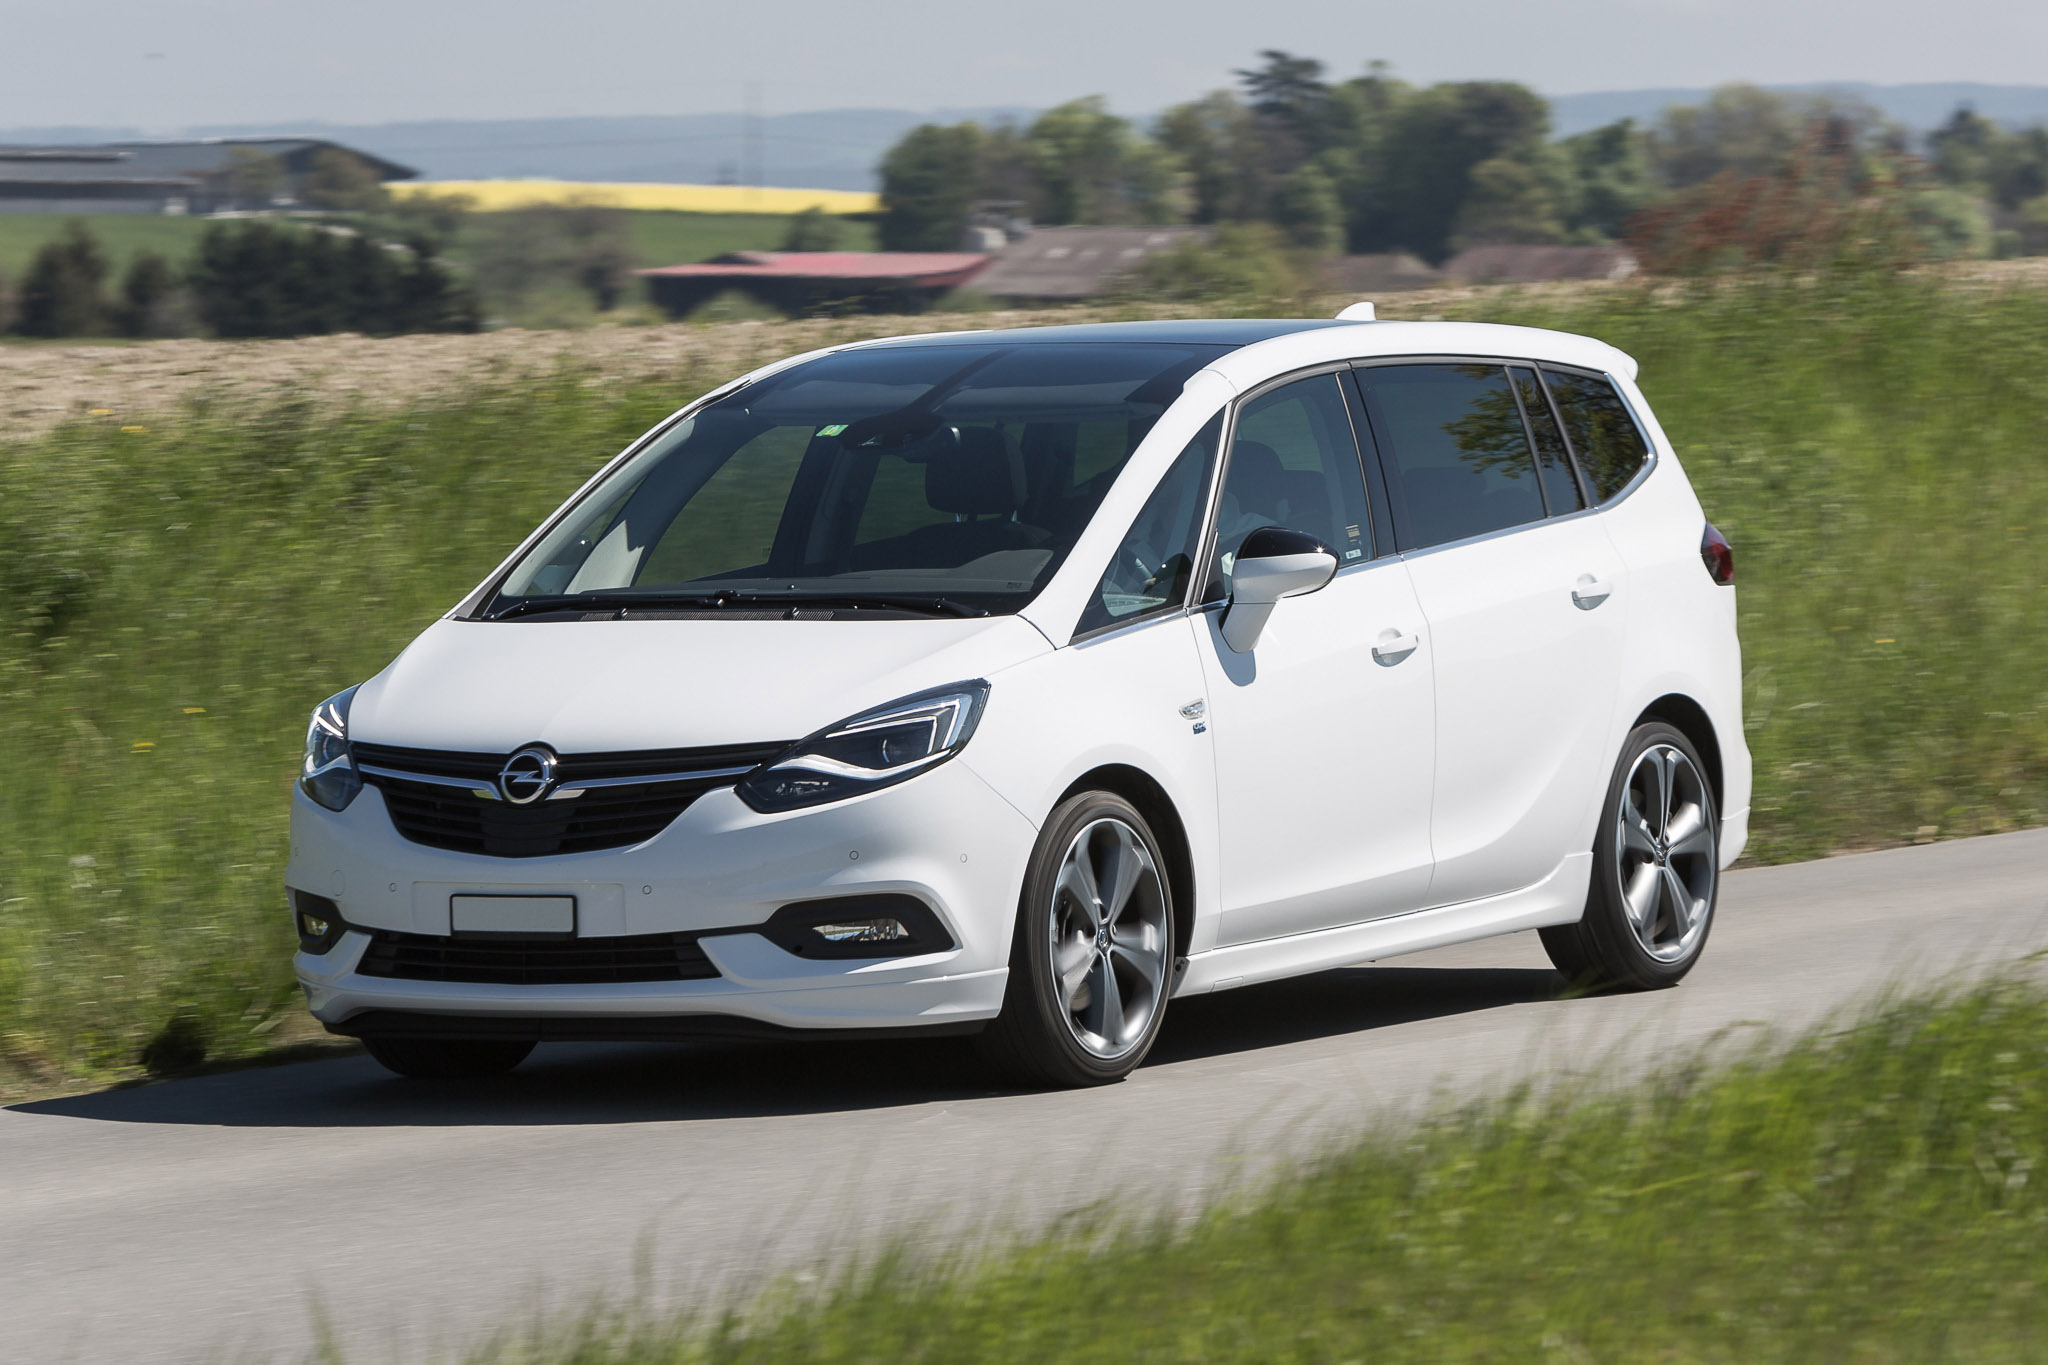 Leasing Opel Zafira 2018 et Location longue durée LOA